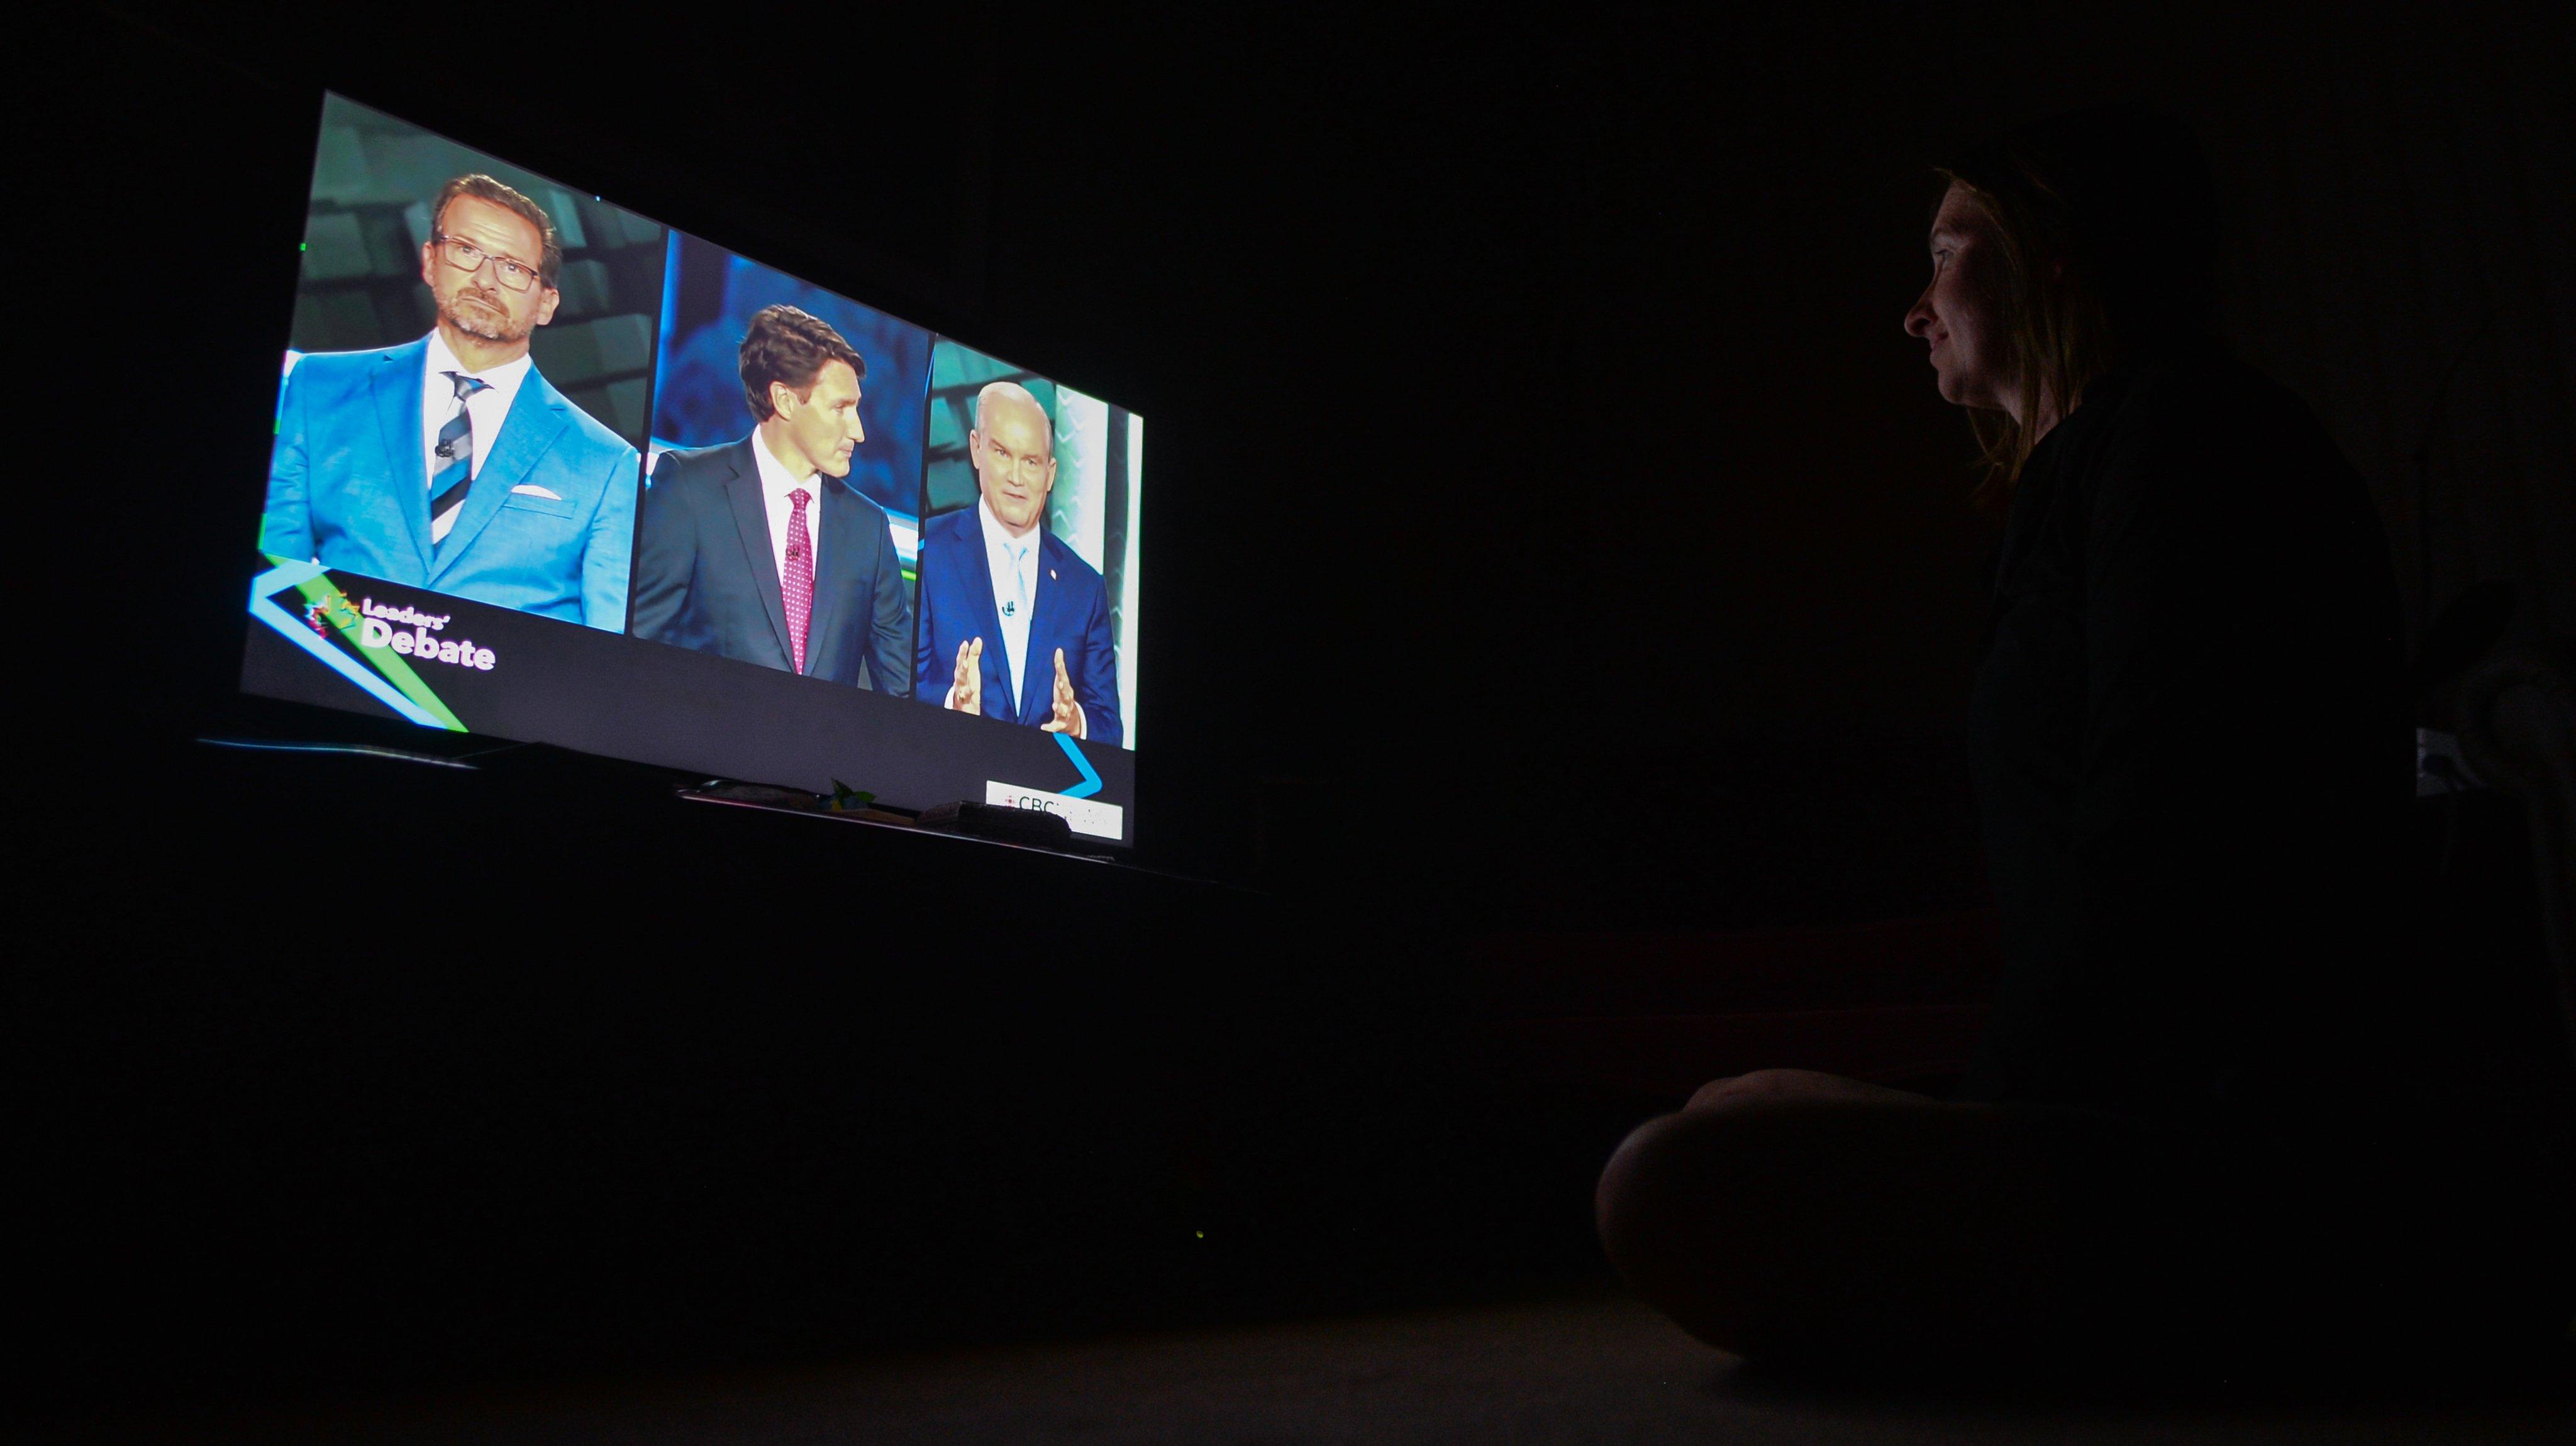 Federal Election Leaders' Debate In Canada